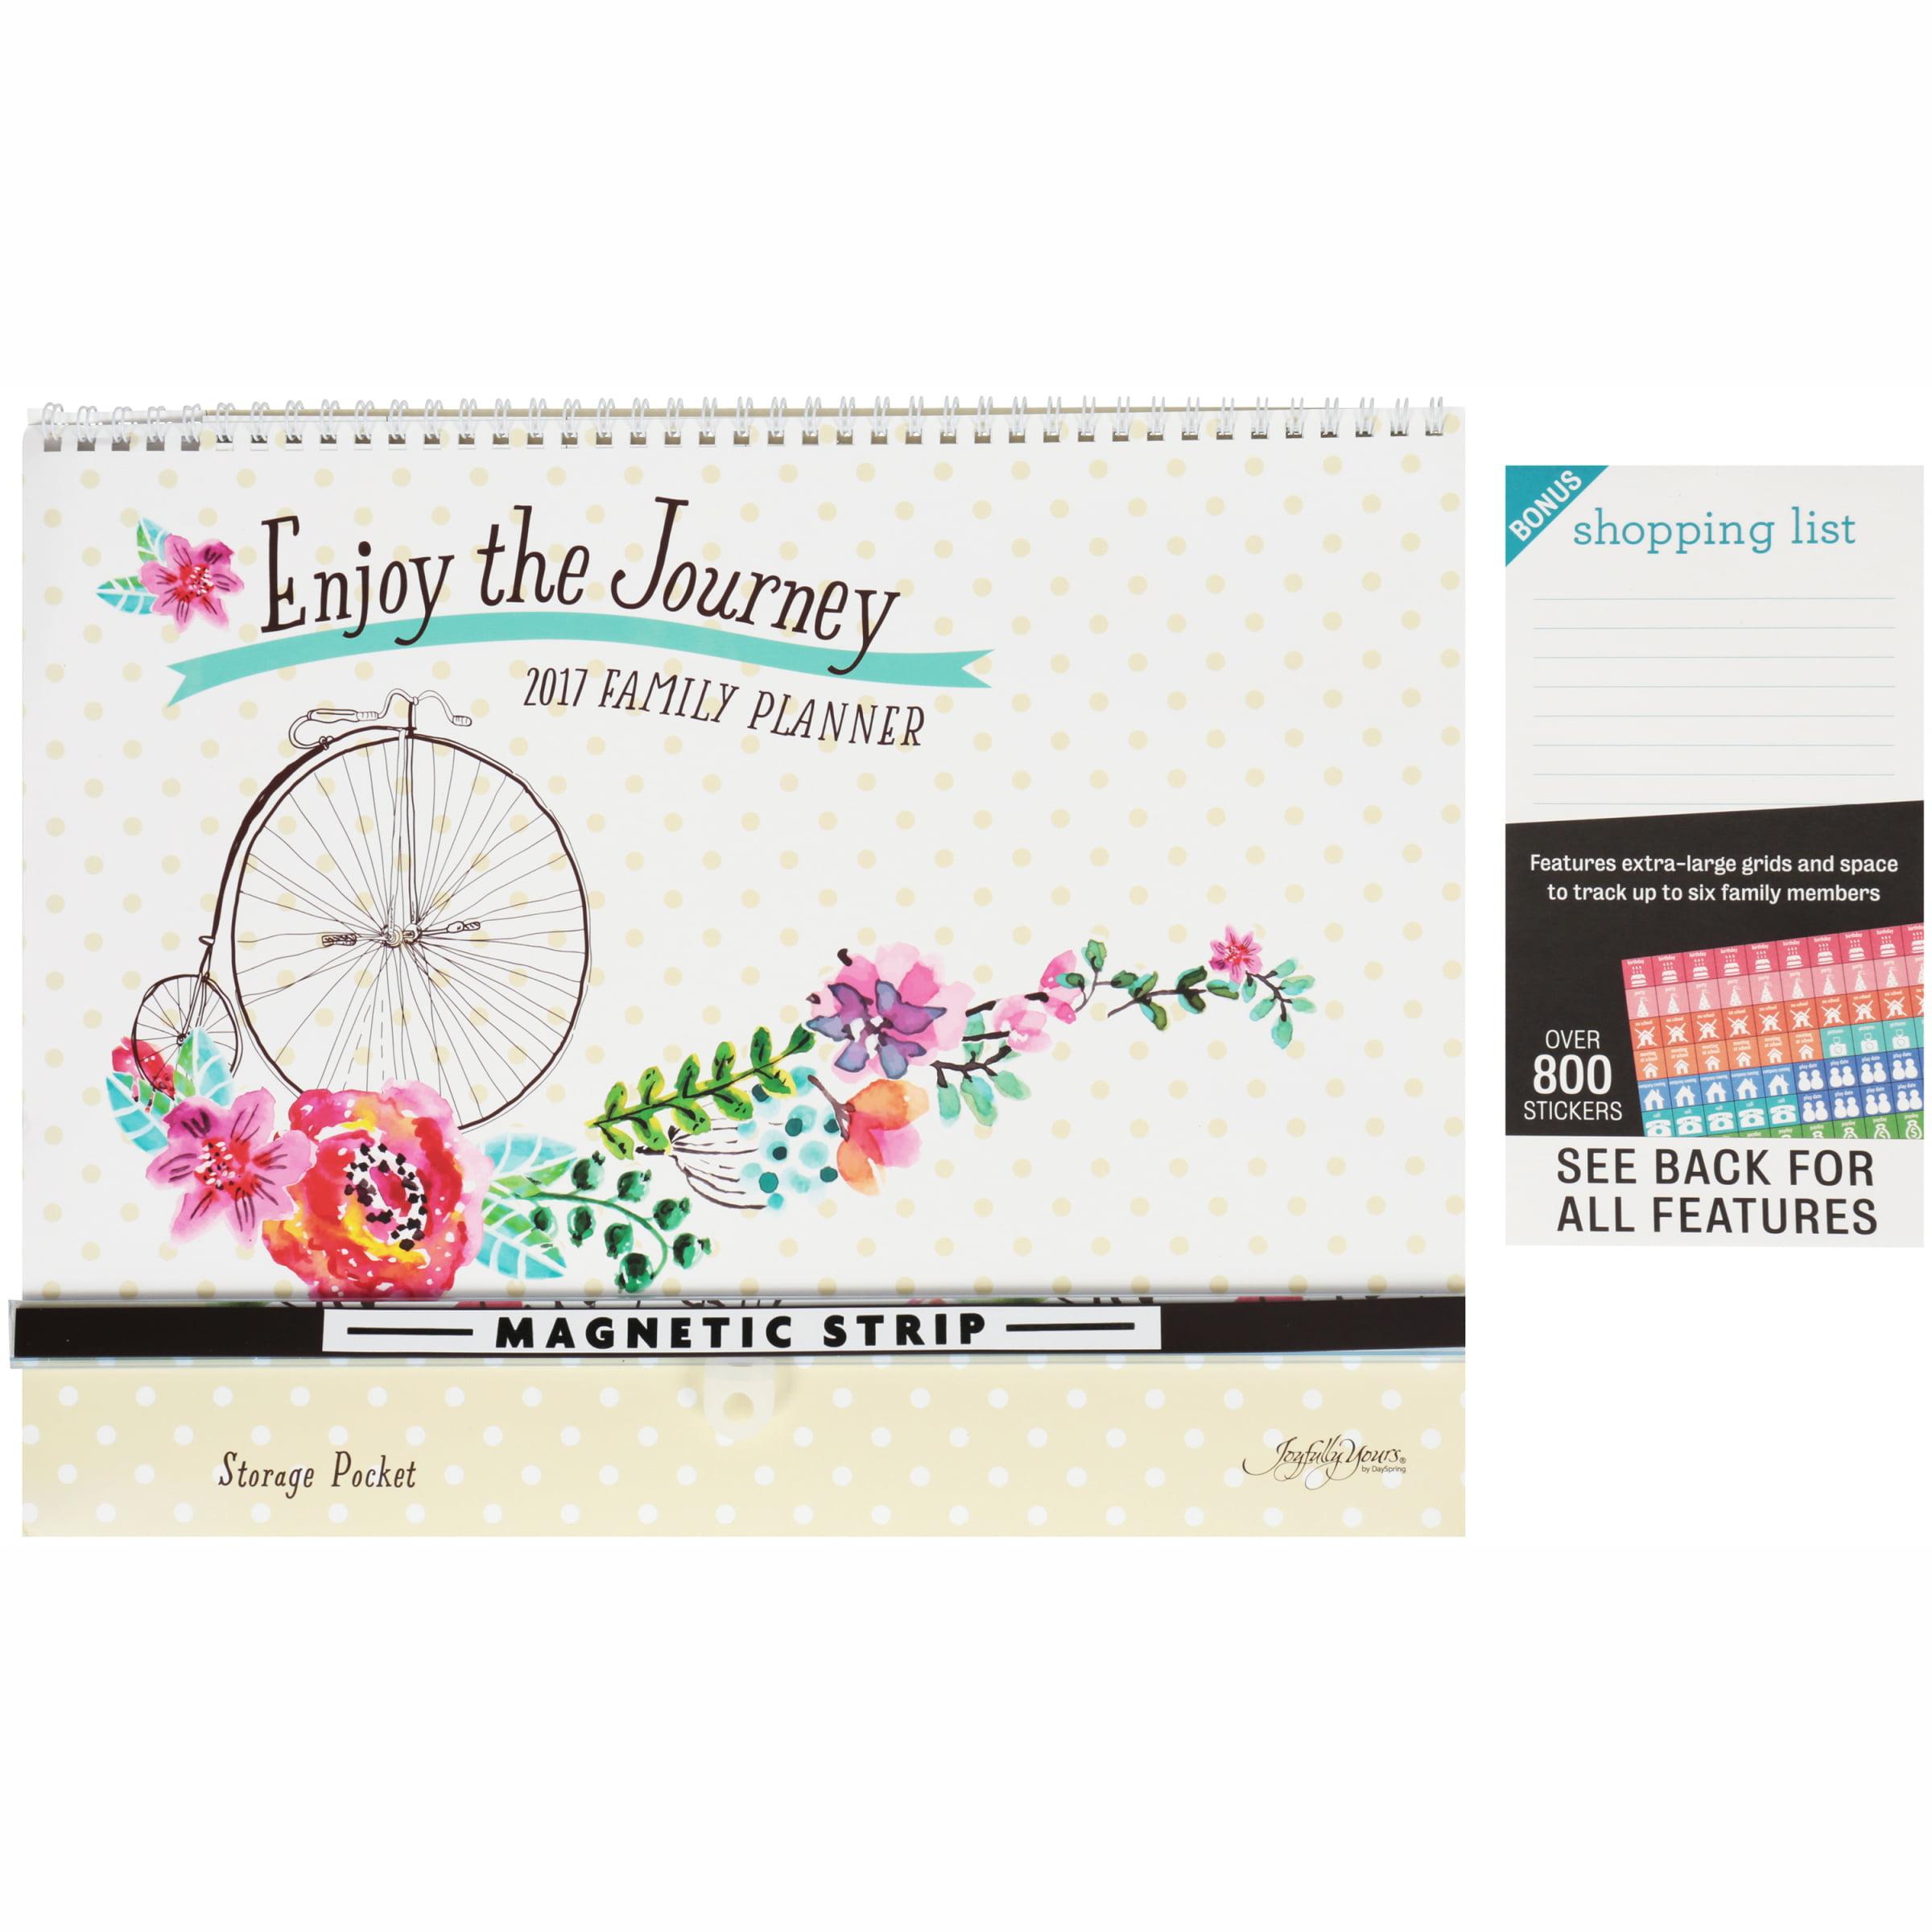 Dayspring Joyfully Yours Enjoy The Journey 2017 Family Planner